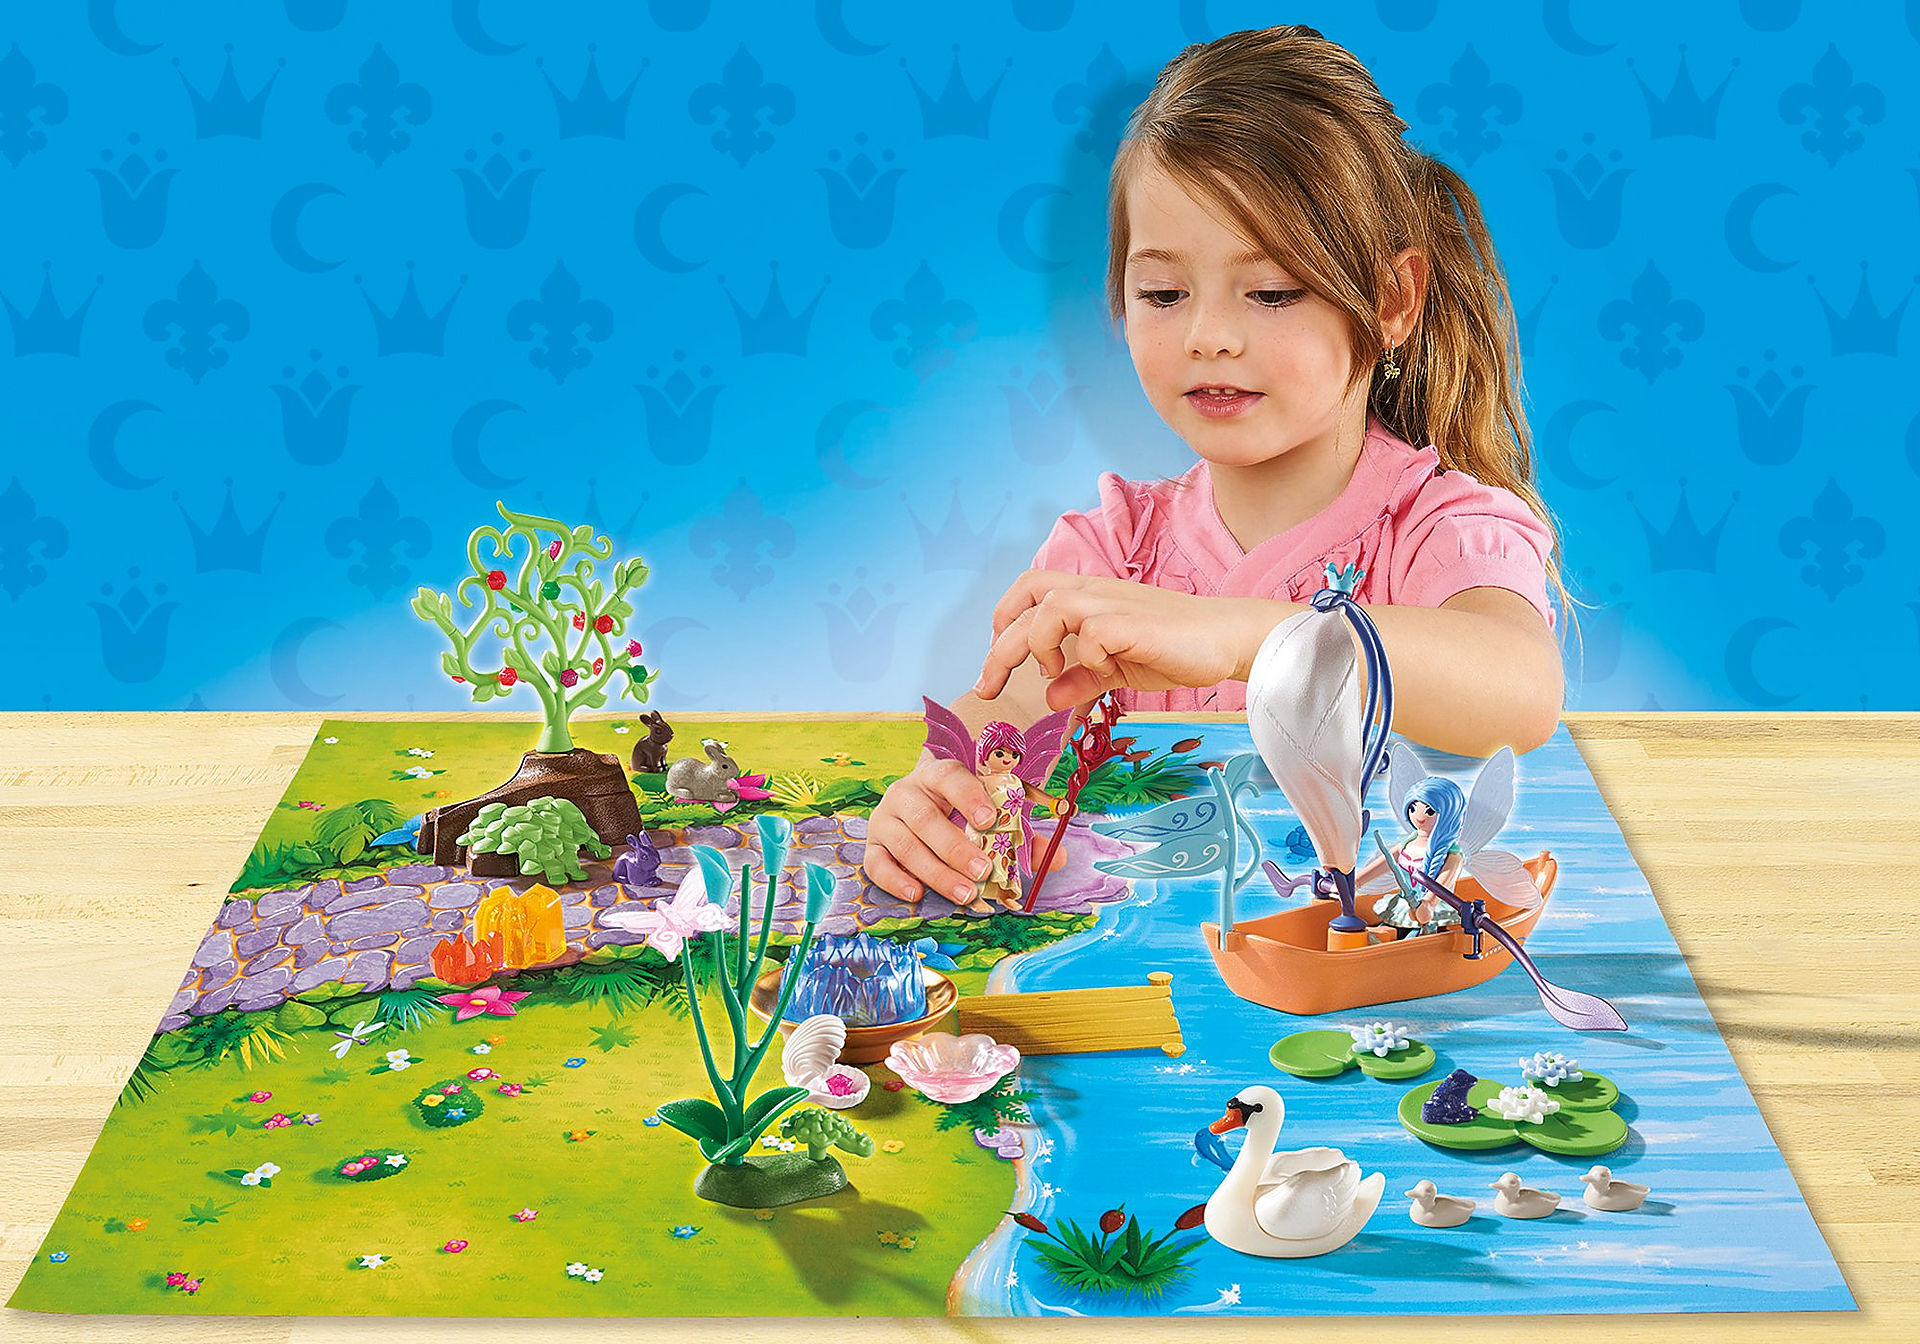 9330 Fairy Garden Play Map zoom image1